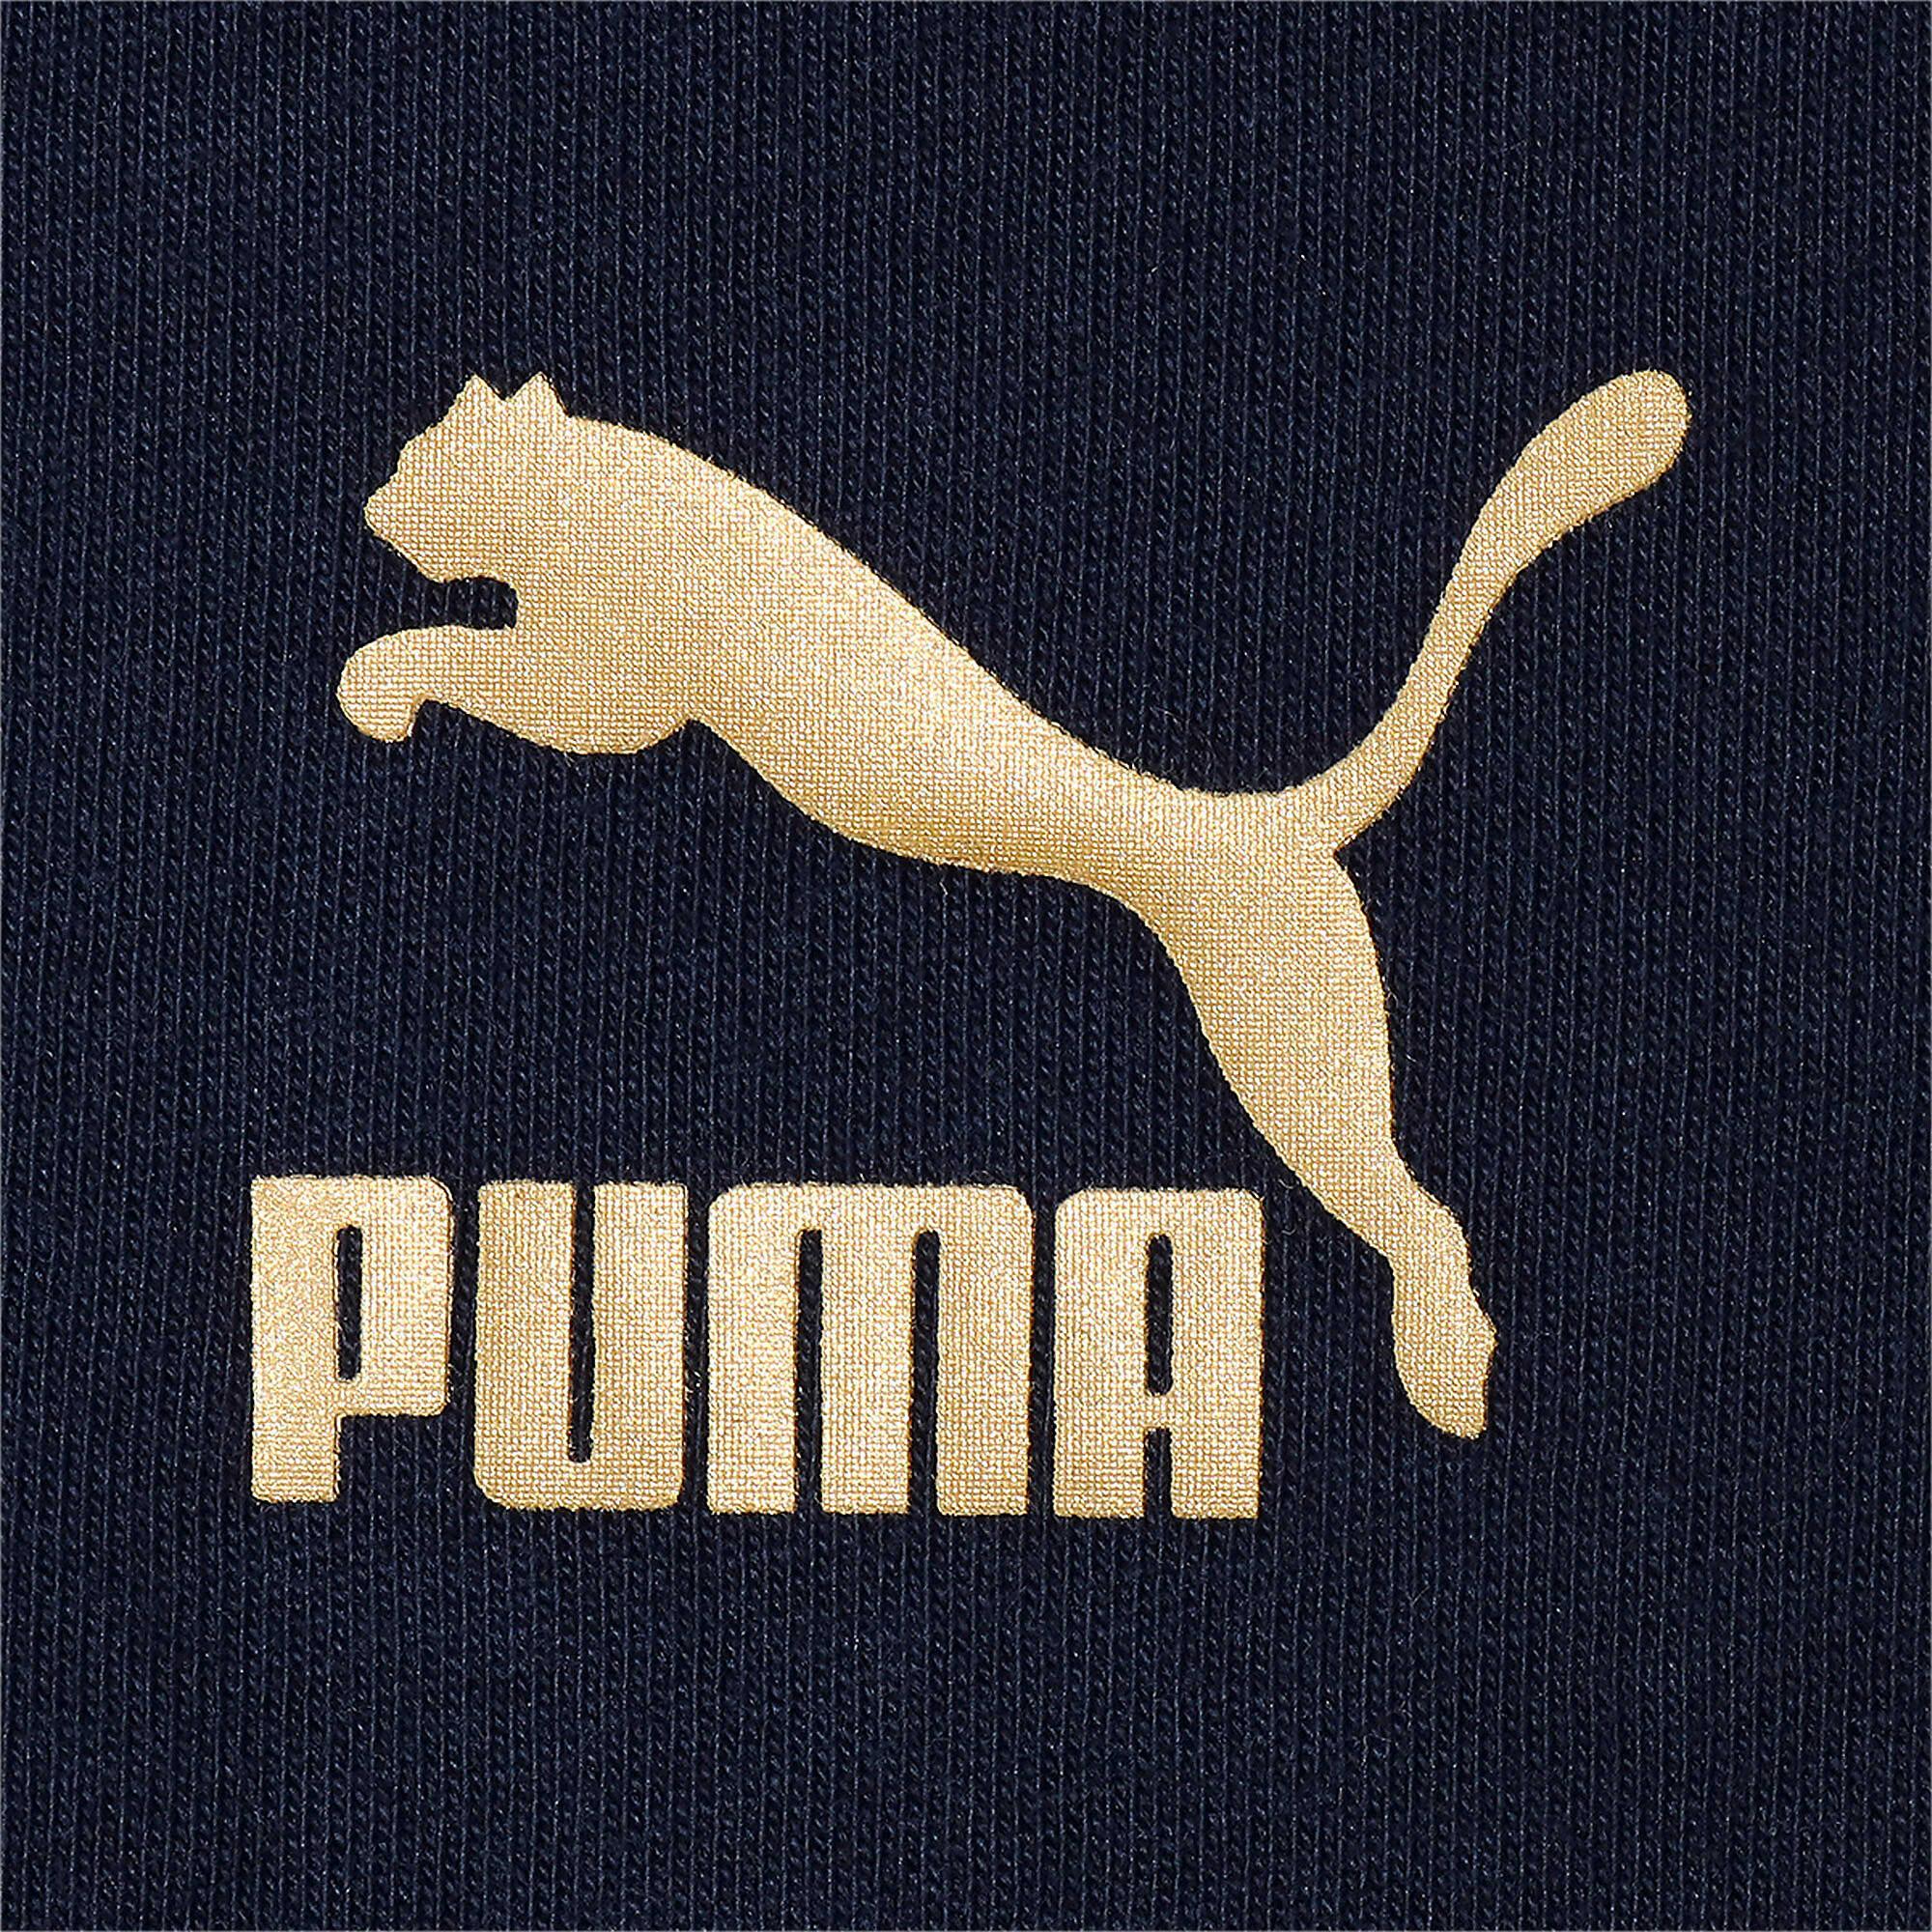 Thumbnail 4 of FIGC イタリア ICONIC MCS Tシャツ 半袖, Ponderosa Pine-peacoat, medium-JPN